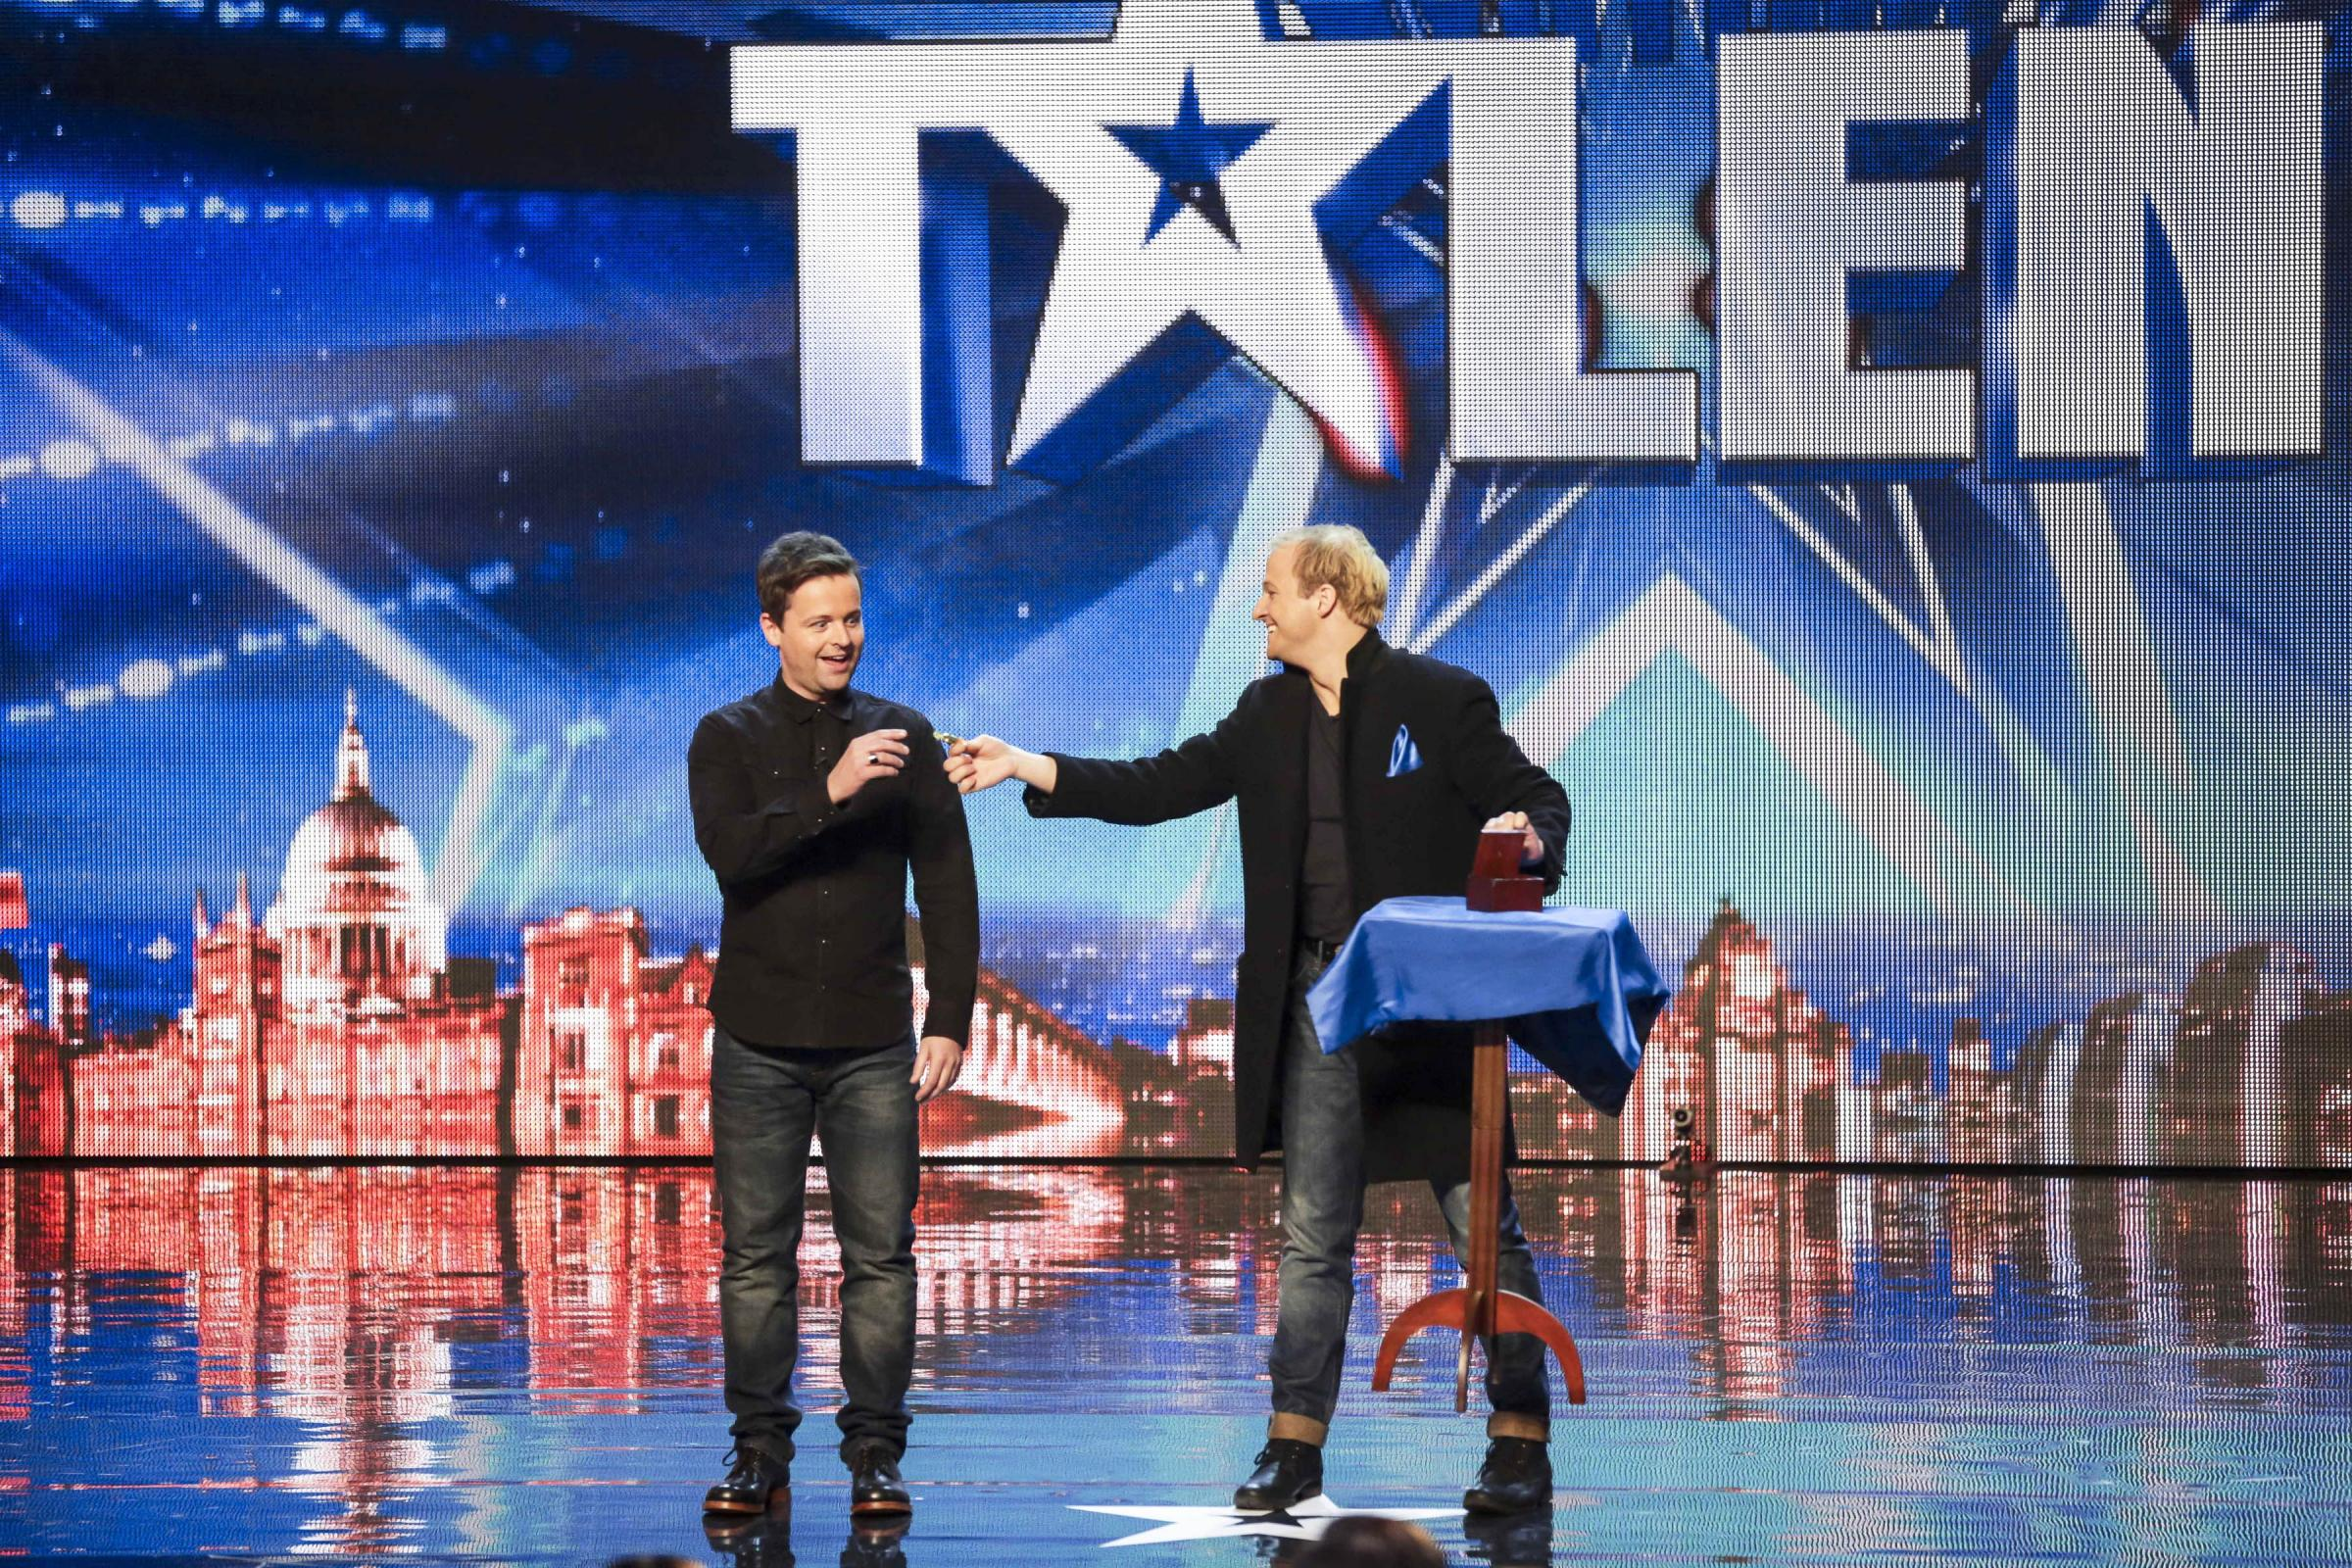 Basingstoke Magician Alex Lodge Fails To Impress Simon Cowell And Britain S Got Talent Judging Panel Basingstoke Gazette